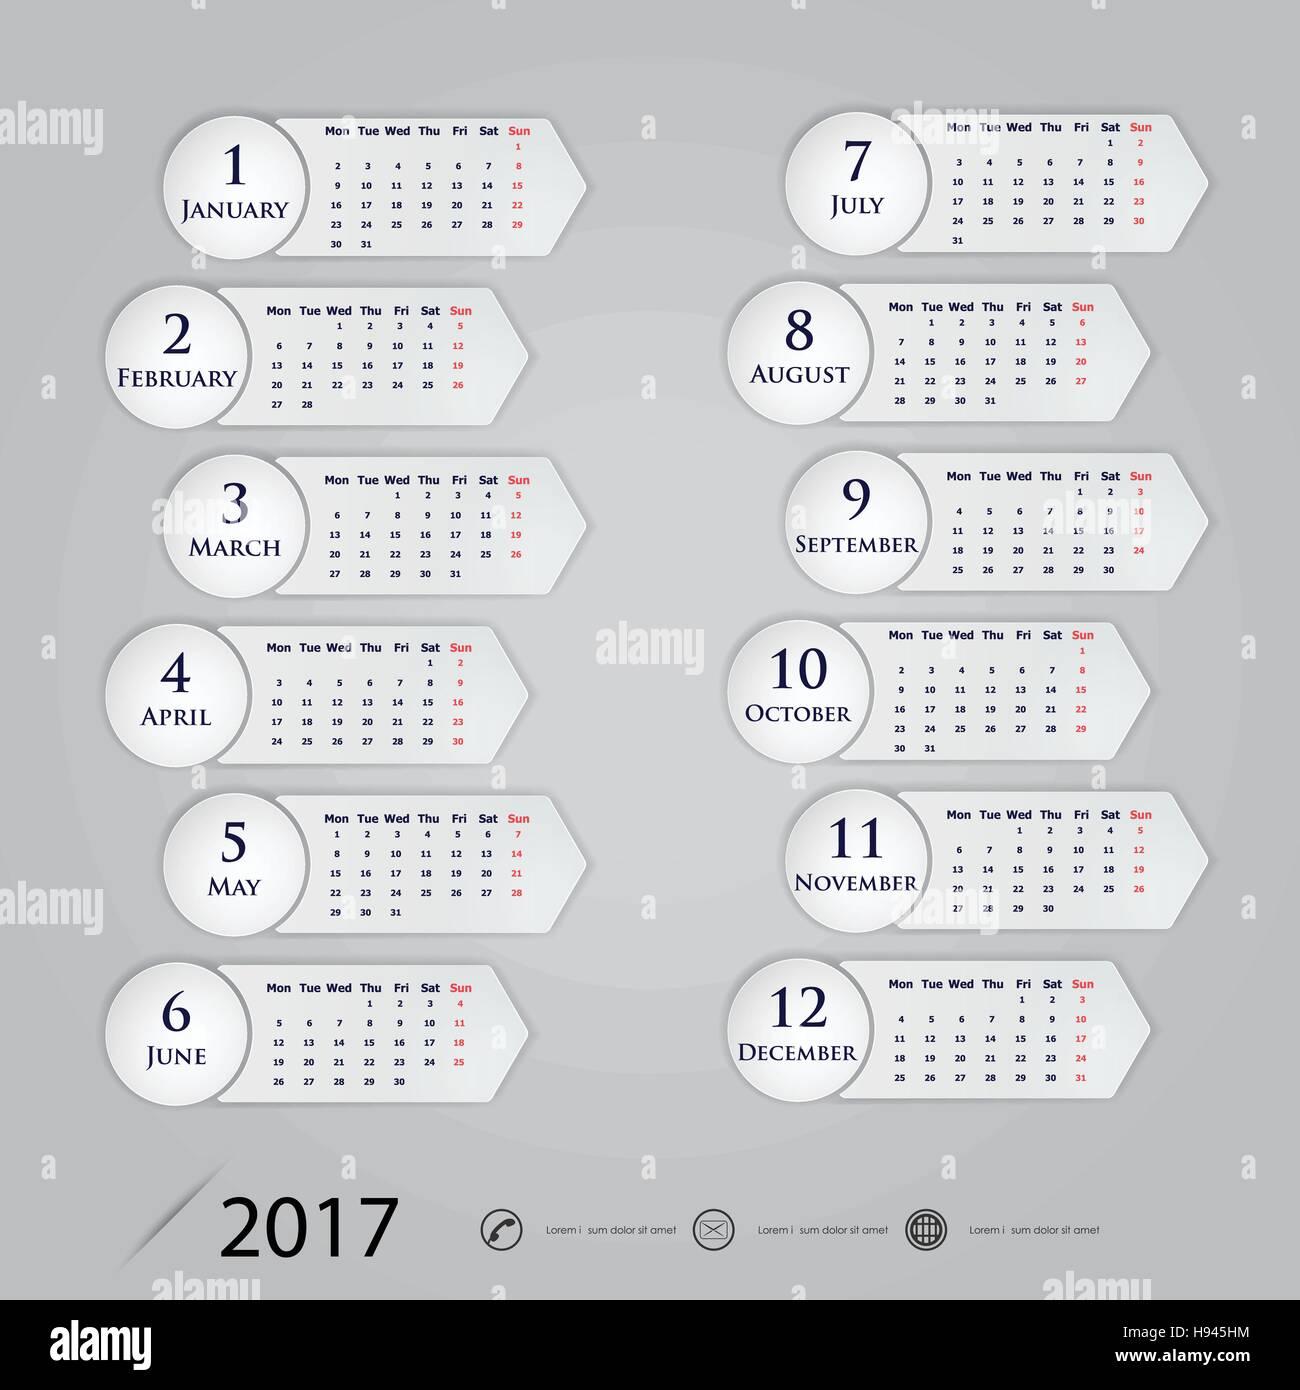 February 2017 Calendar Vector Illustration Stockfotos & February ...